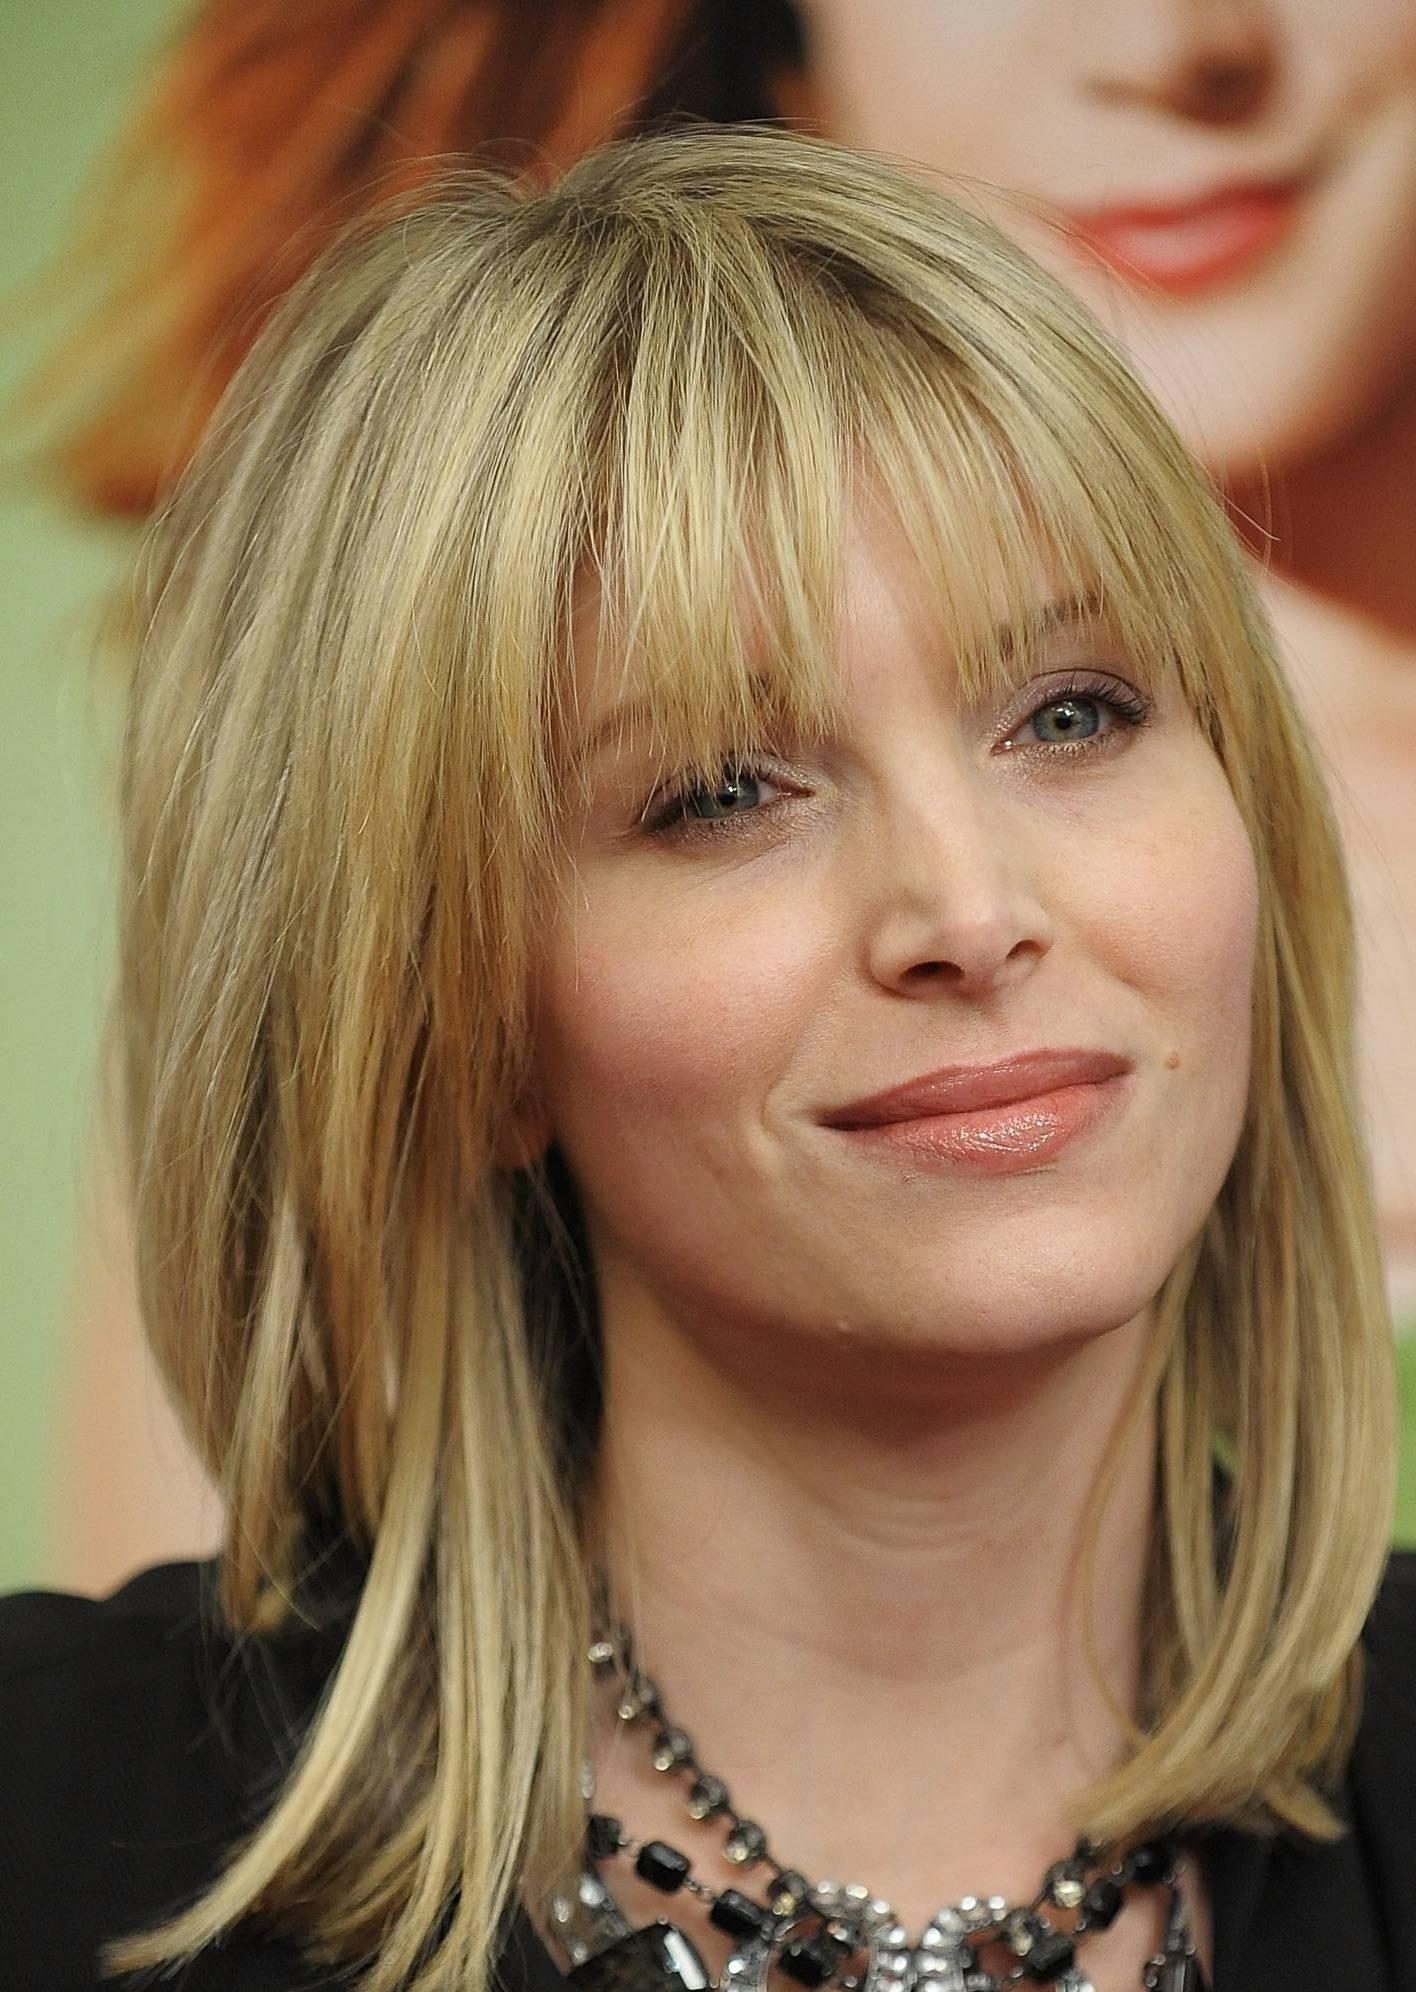 Hairstyles For Women Over 40   Hair   Medium Hair Cuts inside Over The Shoulder Hair Cut